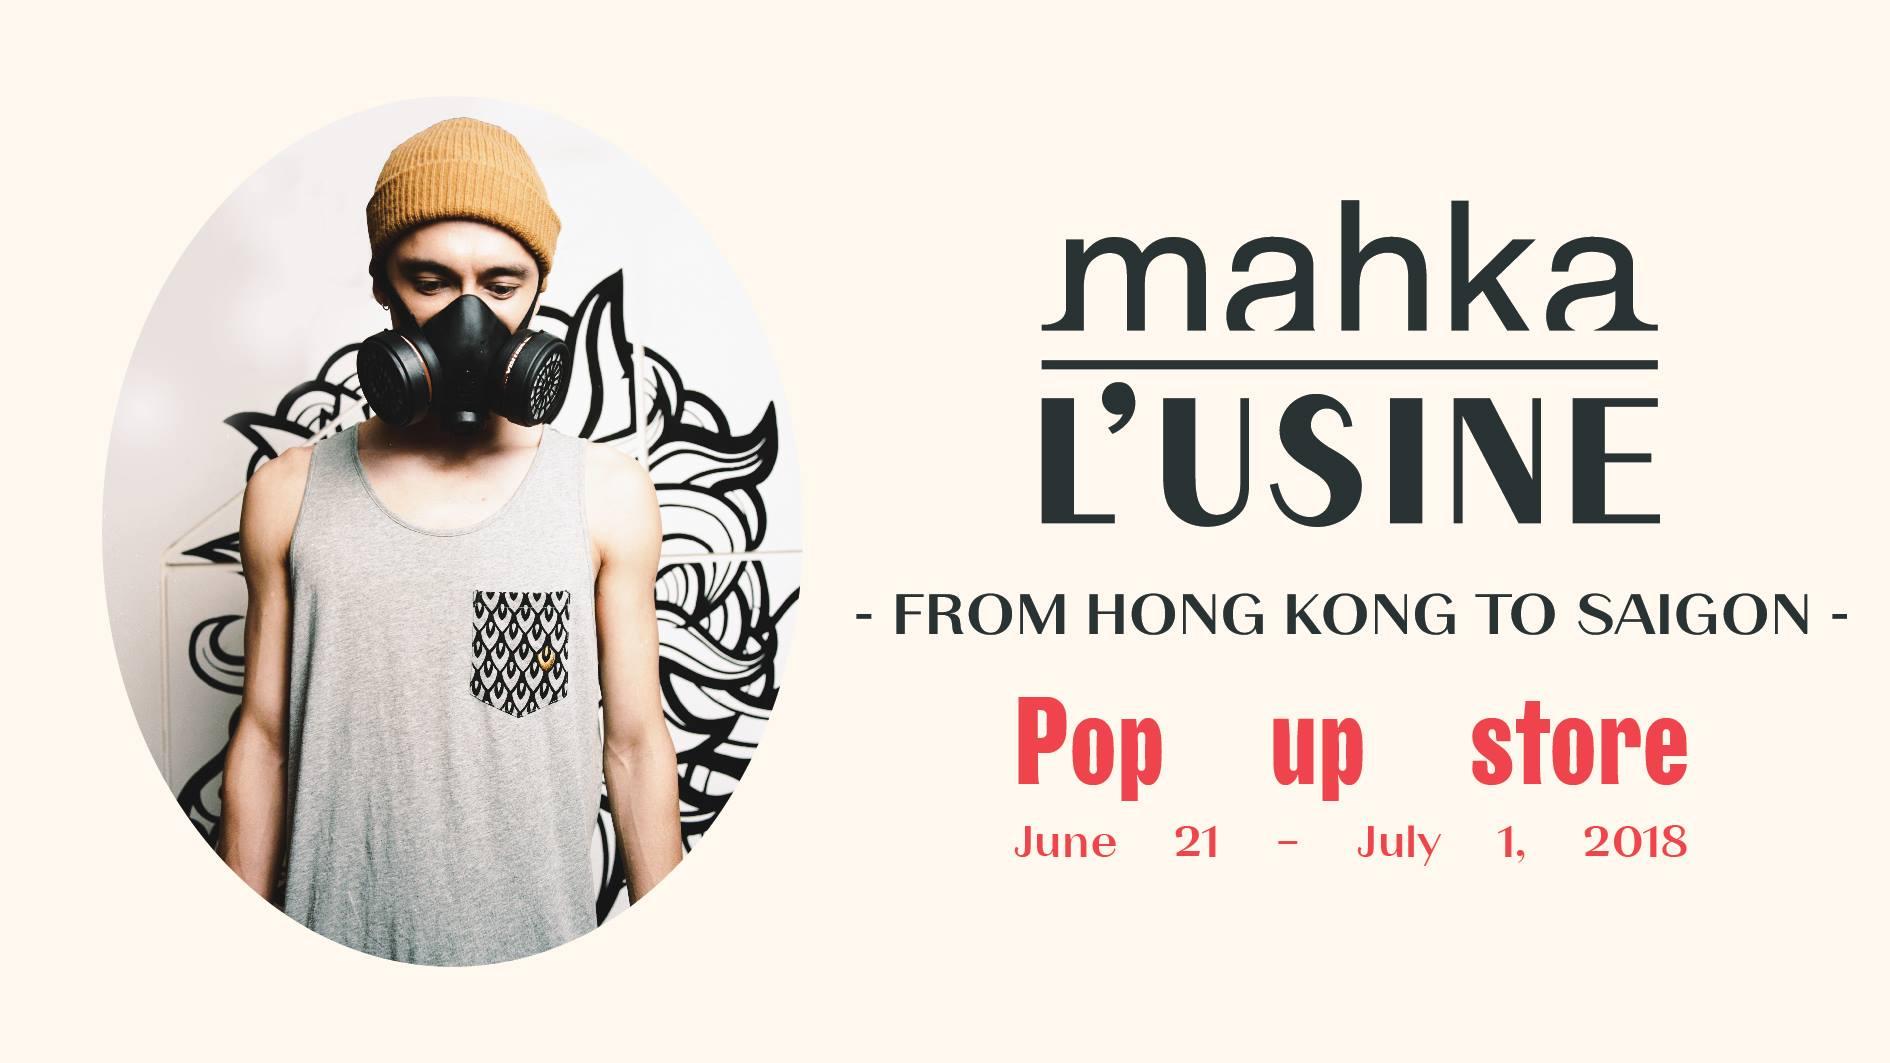 Mahka meets L'Usine: From Hong Kong to Saigon